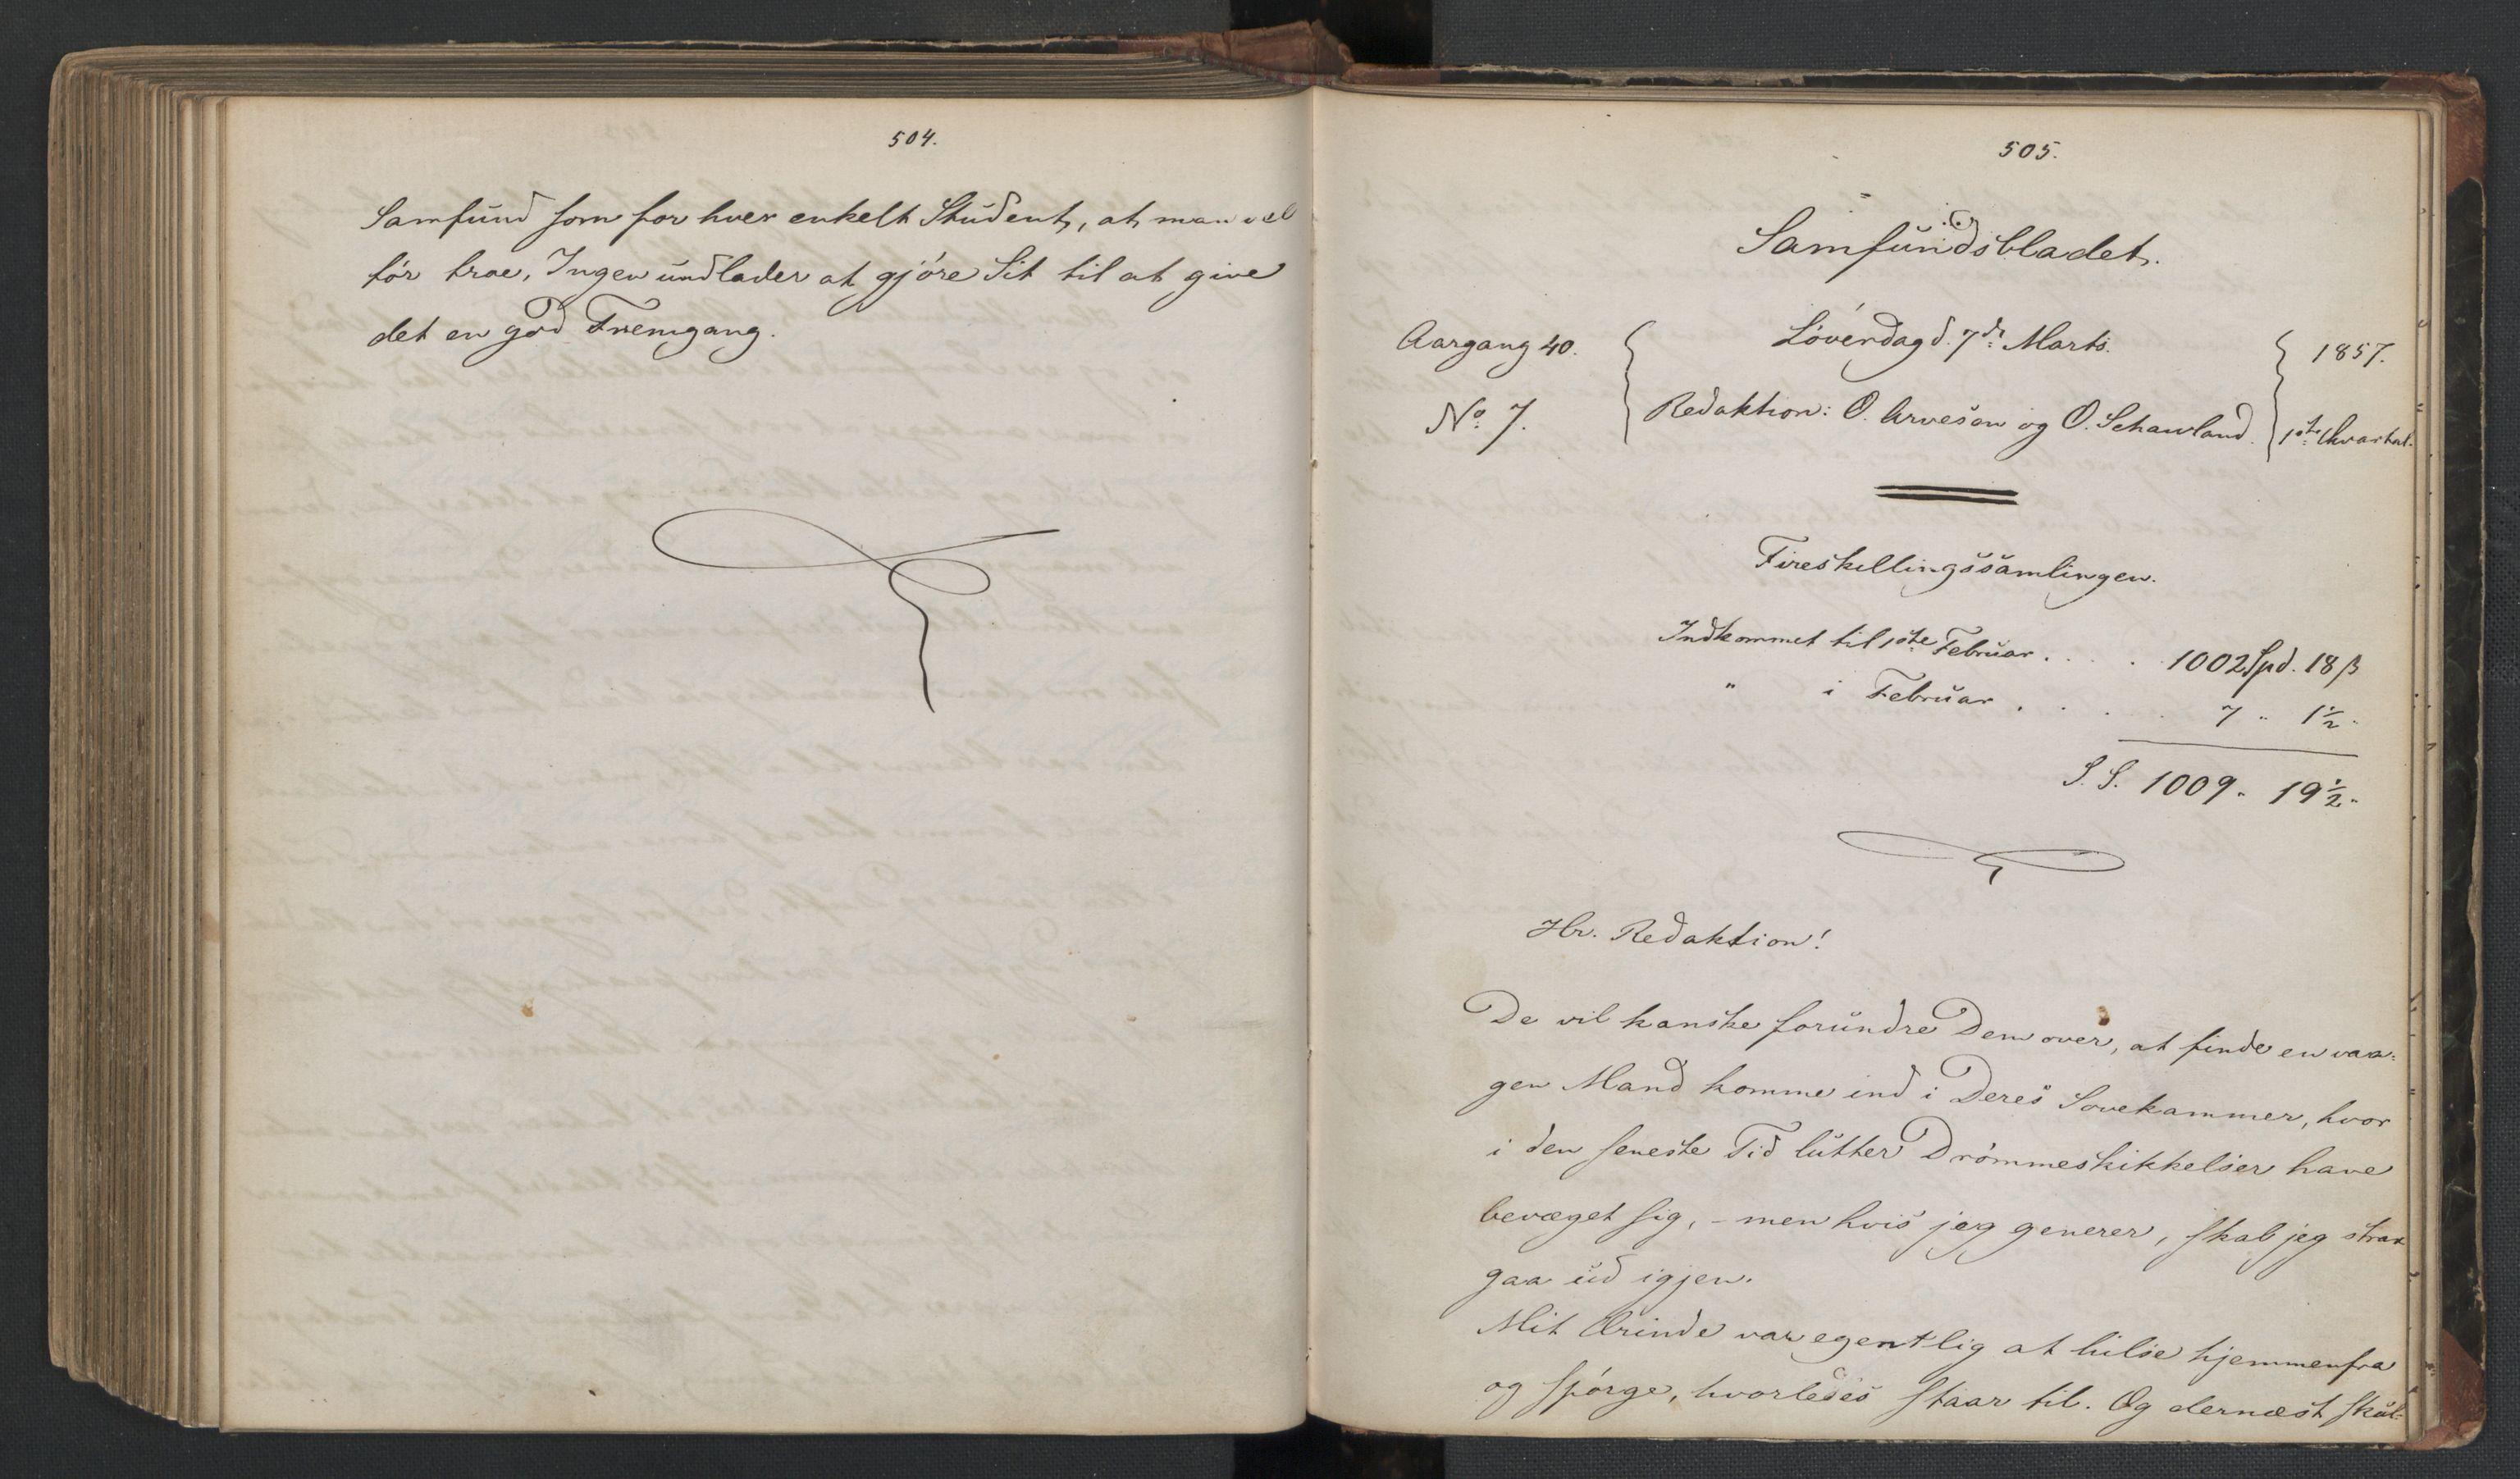 RA, Det Norske Studentersamfund, X/Xa/L0006, 1856-1857, s. 256